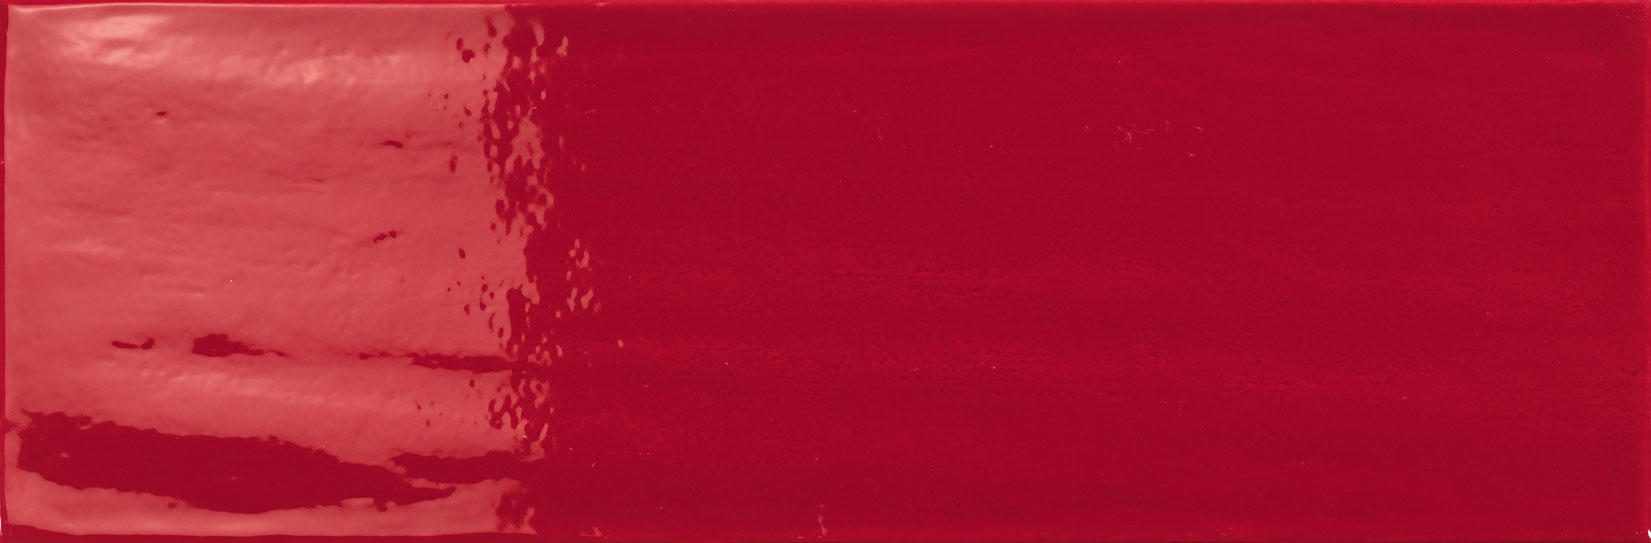 Rubino 20x60